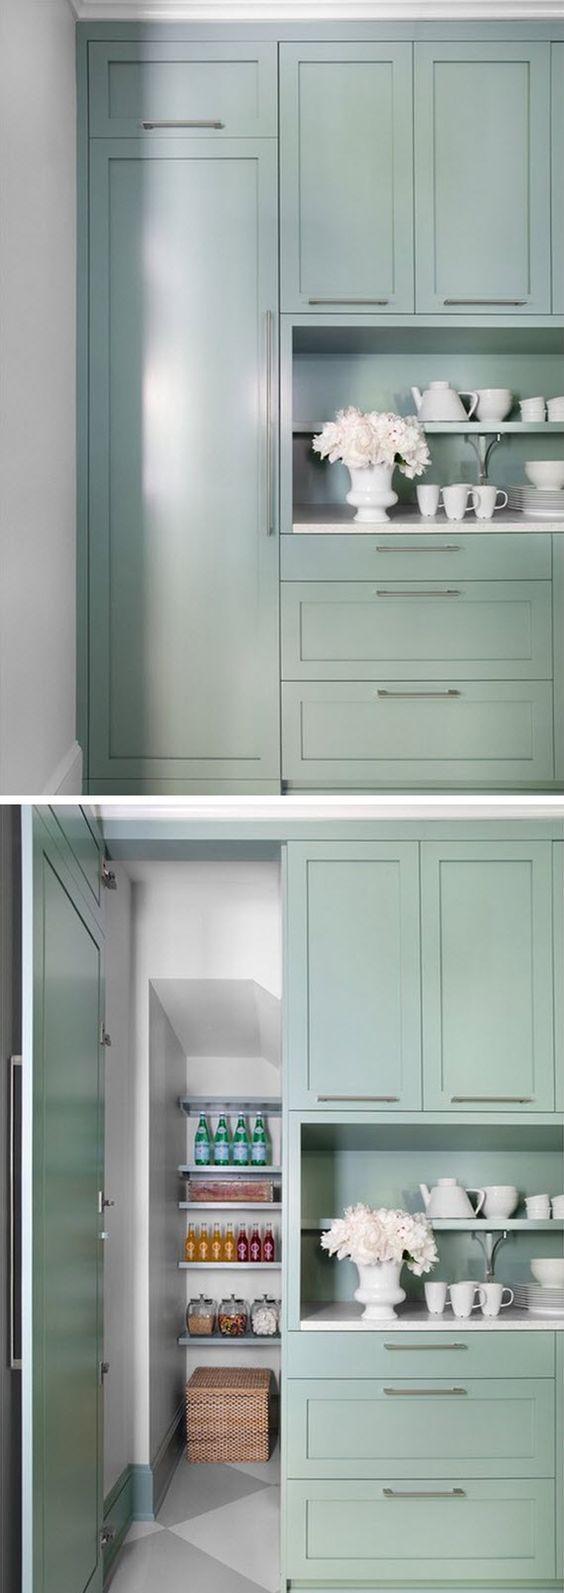 best 25 modern pantry cabinets ideas on pinterest modern kitchen extension uk larder storage. Black Bedroom Furniture Sets. Home Design Ideas